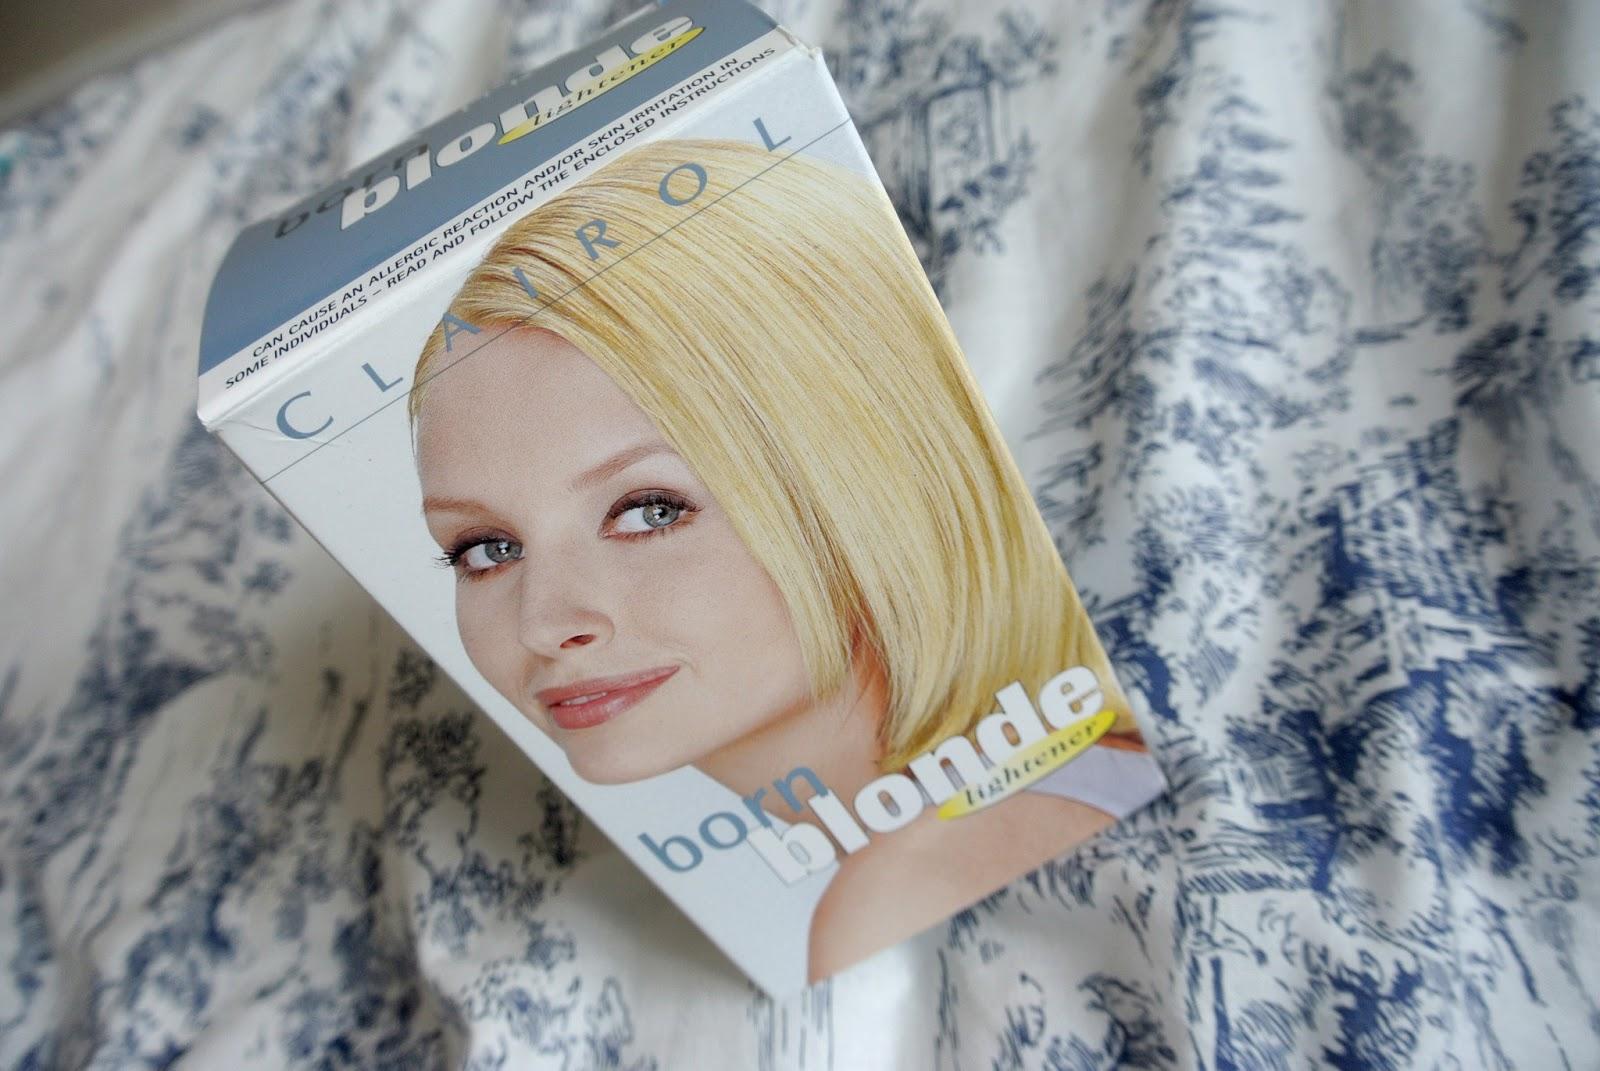 Born Blonde Hair Dye Reviews Best Image Of Blonde Hair 2018